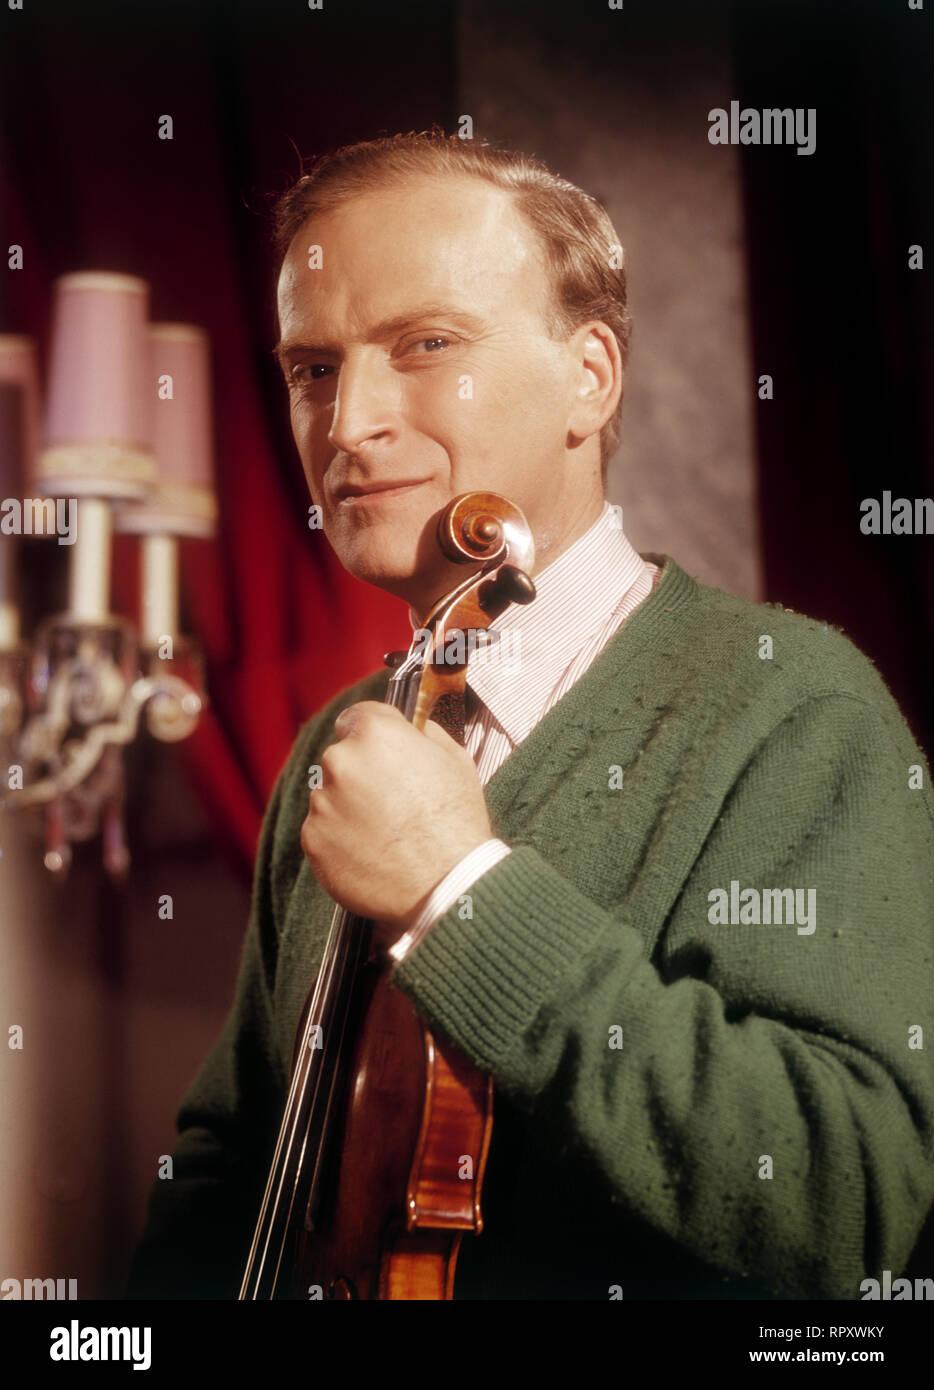 Der berühmte amerikanische Geiger Yehudi Menuhin, 1960. Famous US-American violinist Yehudi Menuhin, 1960. - Stock Image